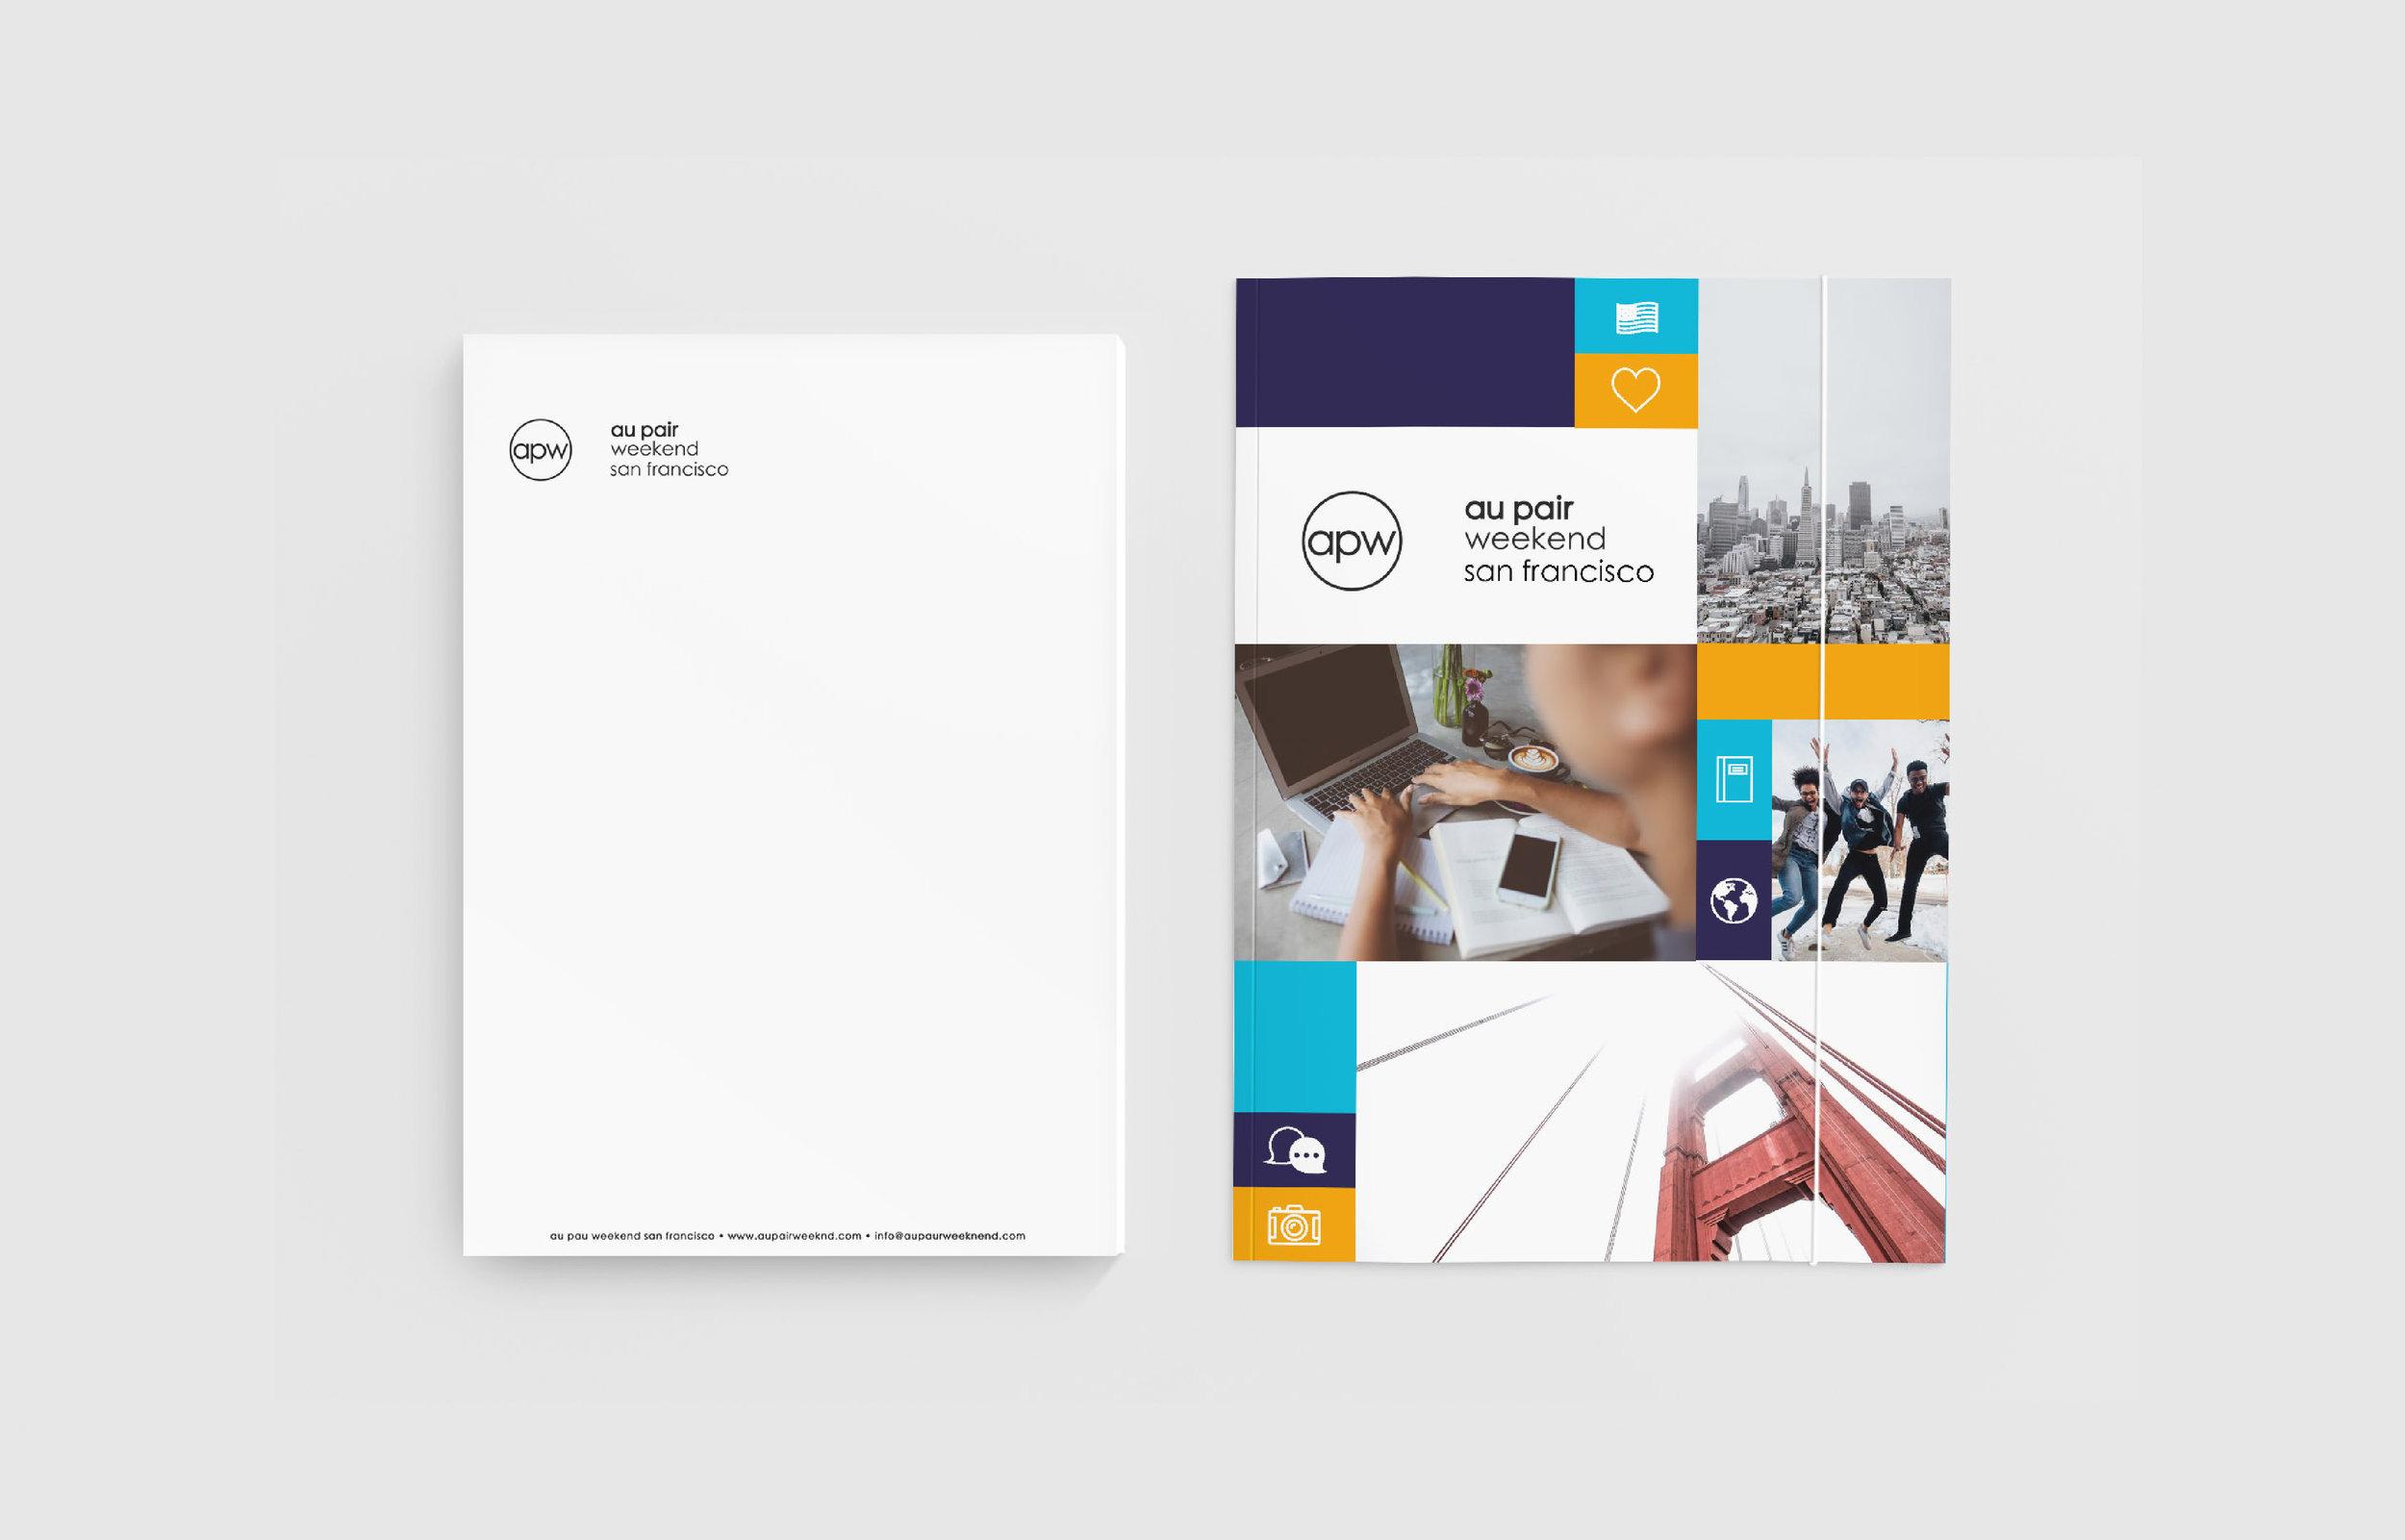 branding-APW6.8.jpg